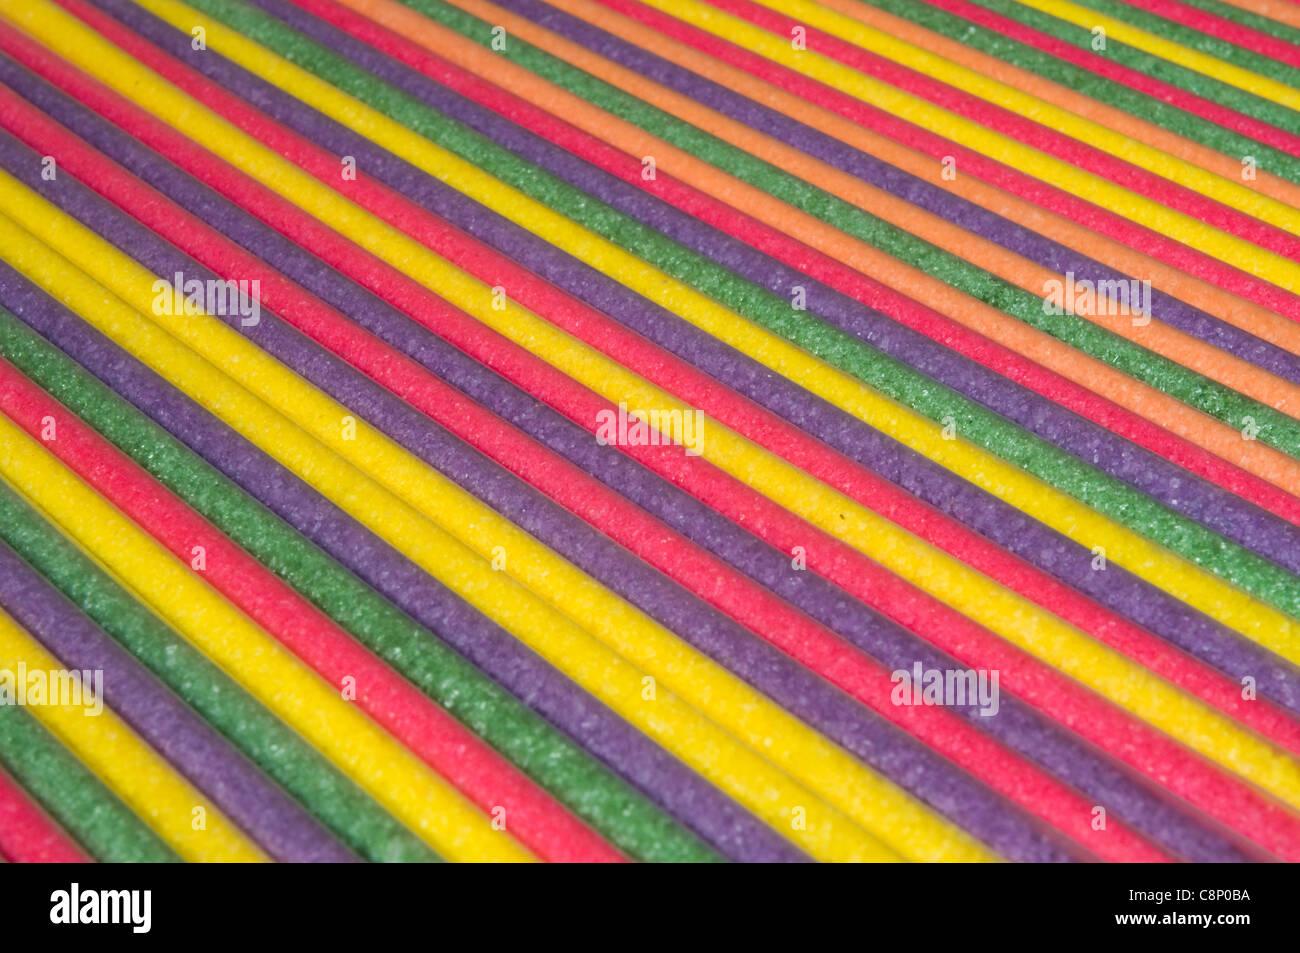 Candy sticks in studio di impostazione Immagini Stock